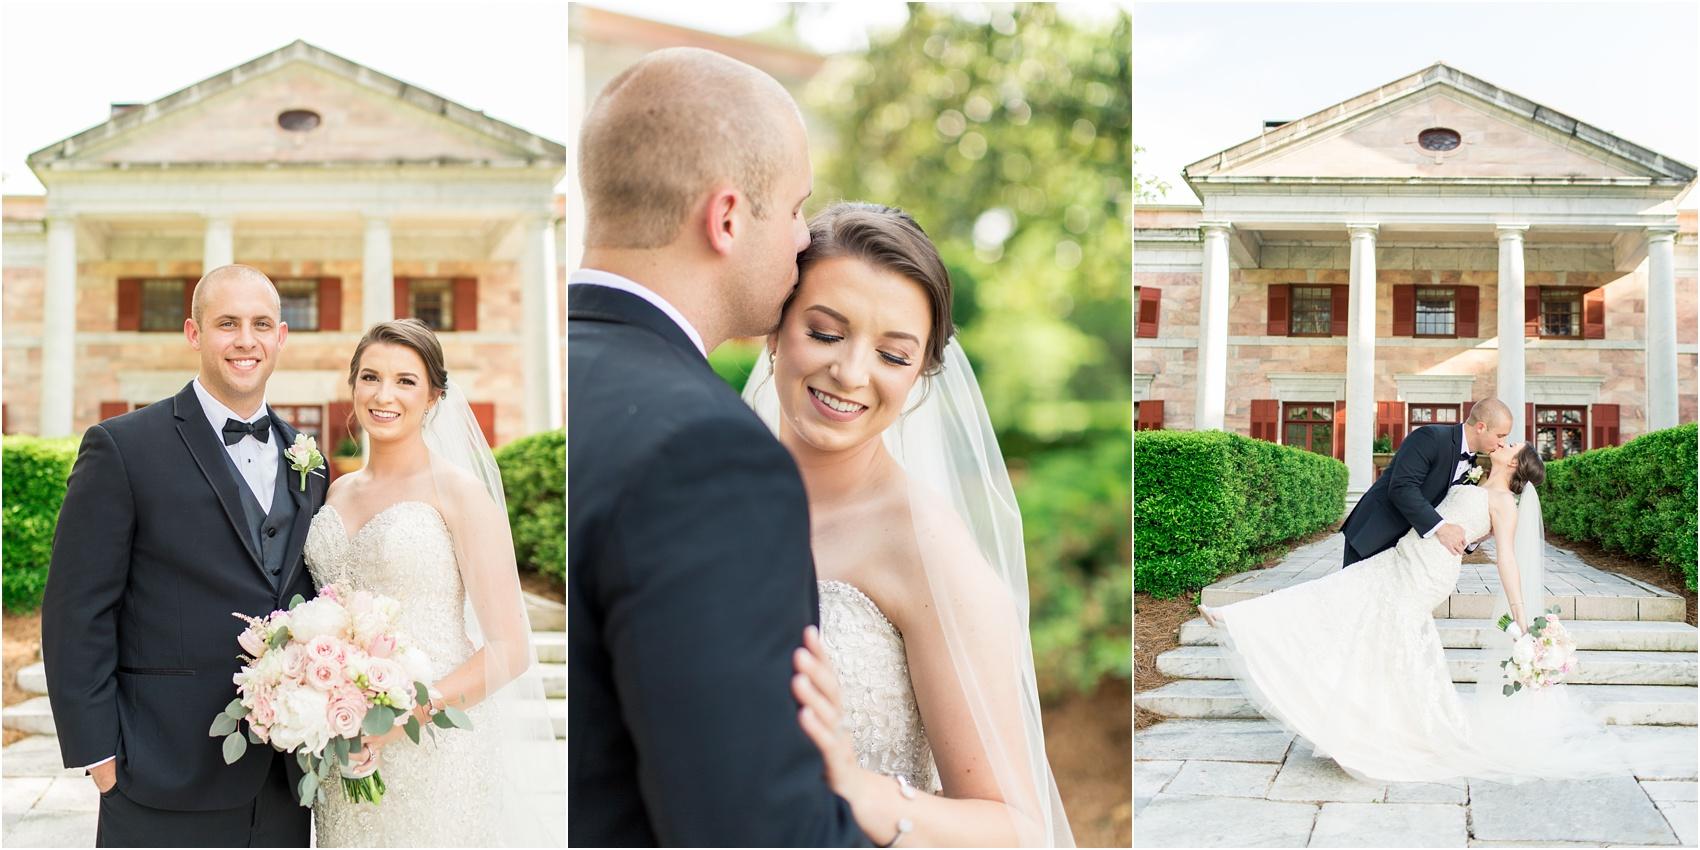 Savannah Eve Photography- Nutt Wedding- Blog-29.jpg